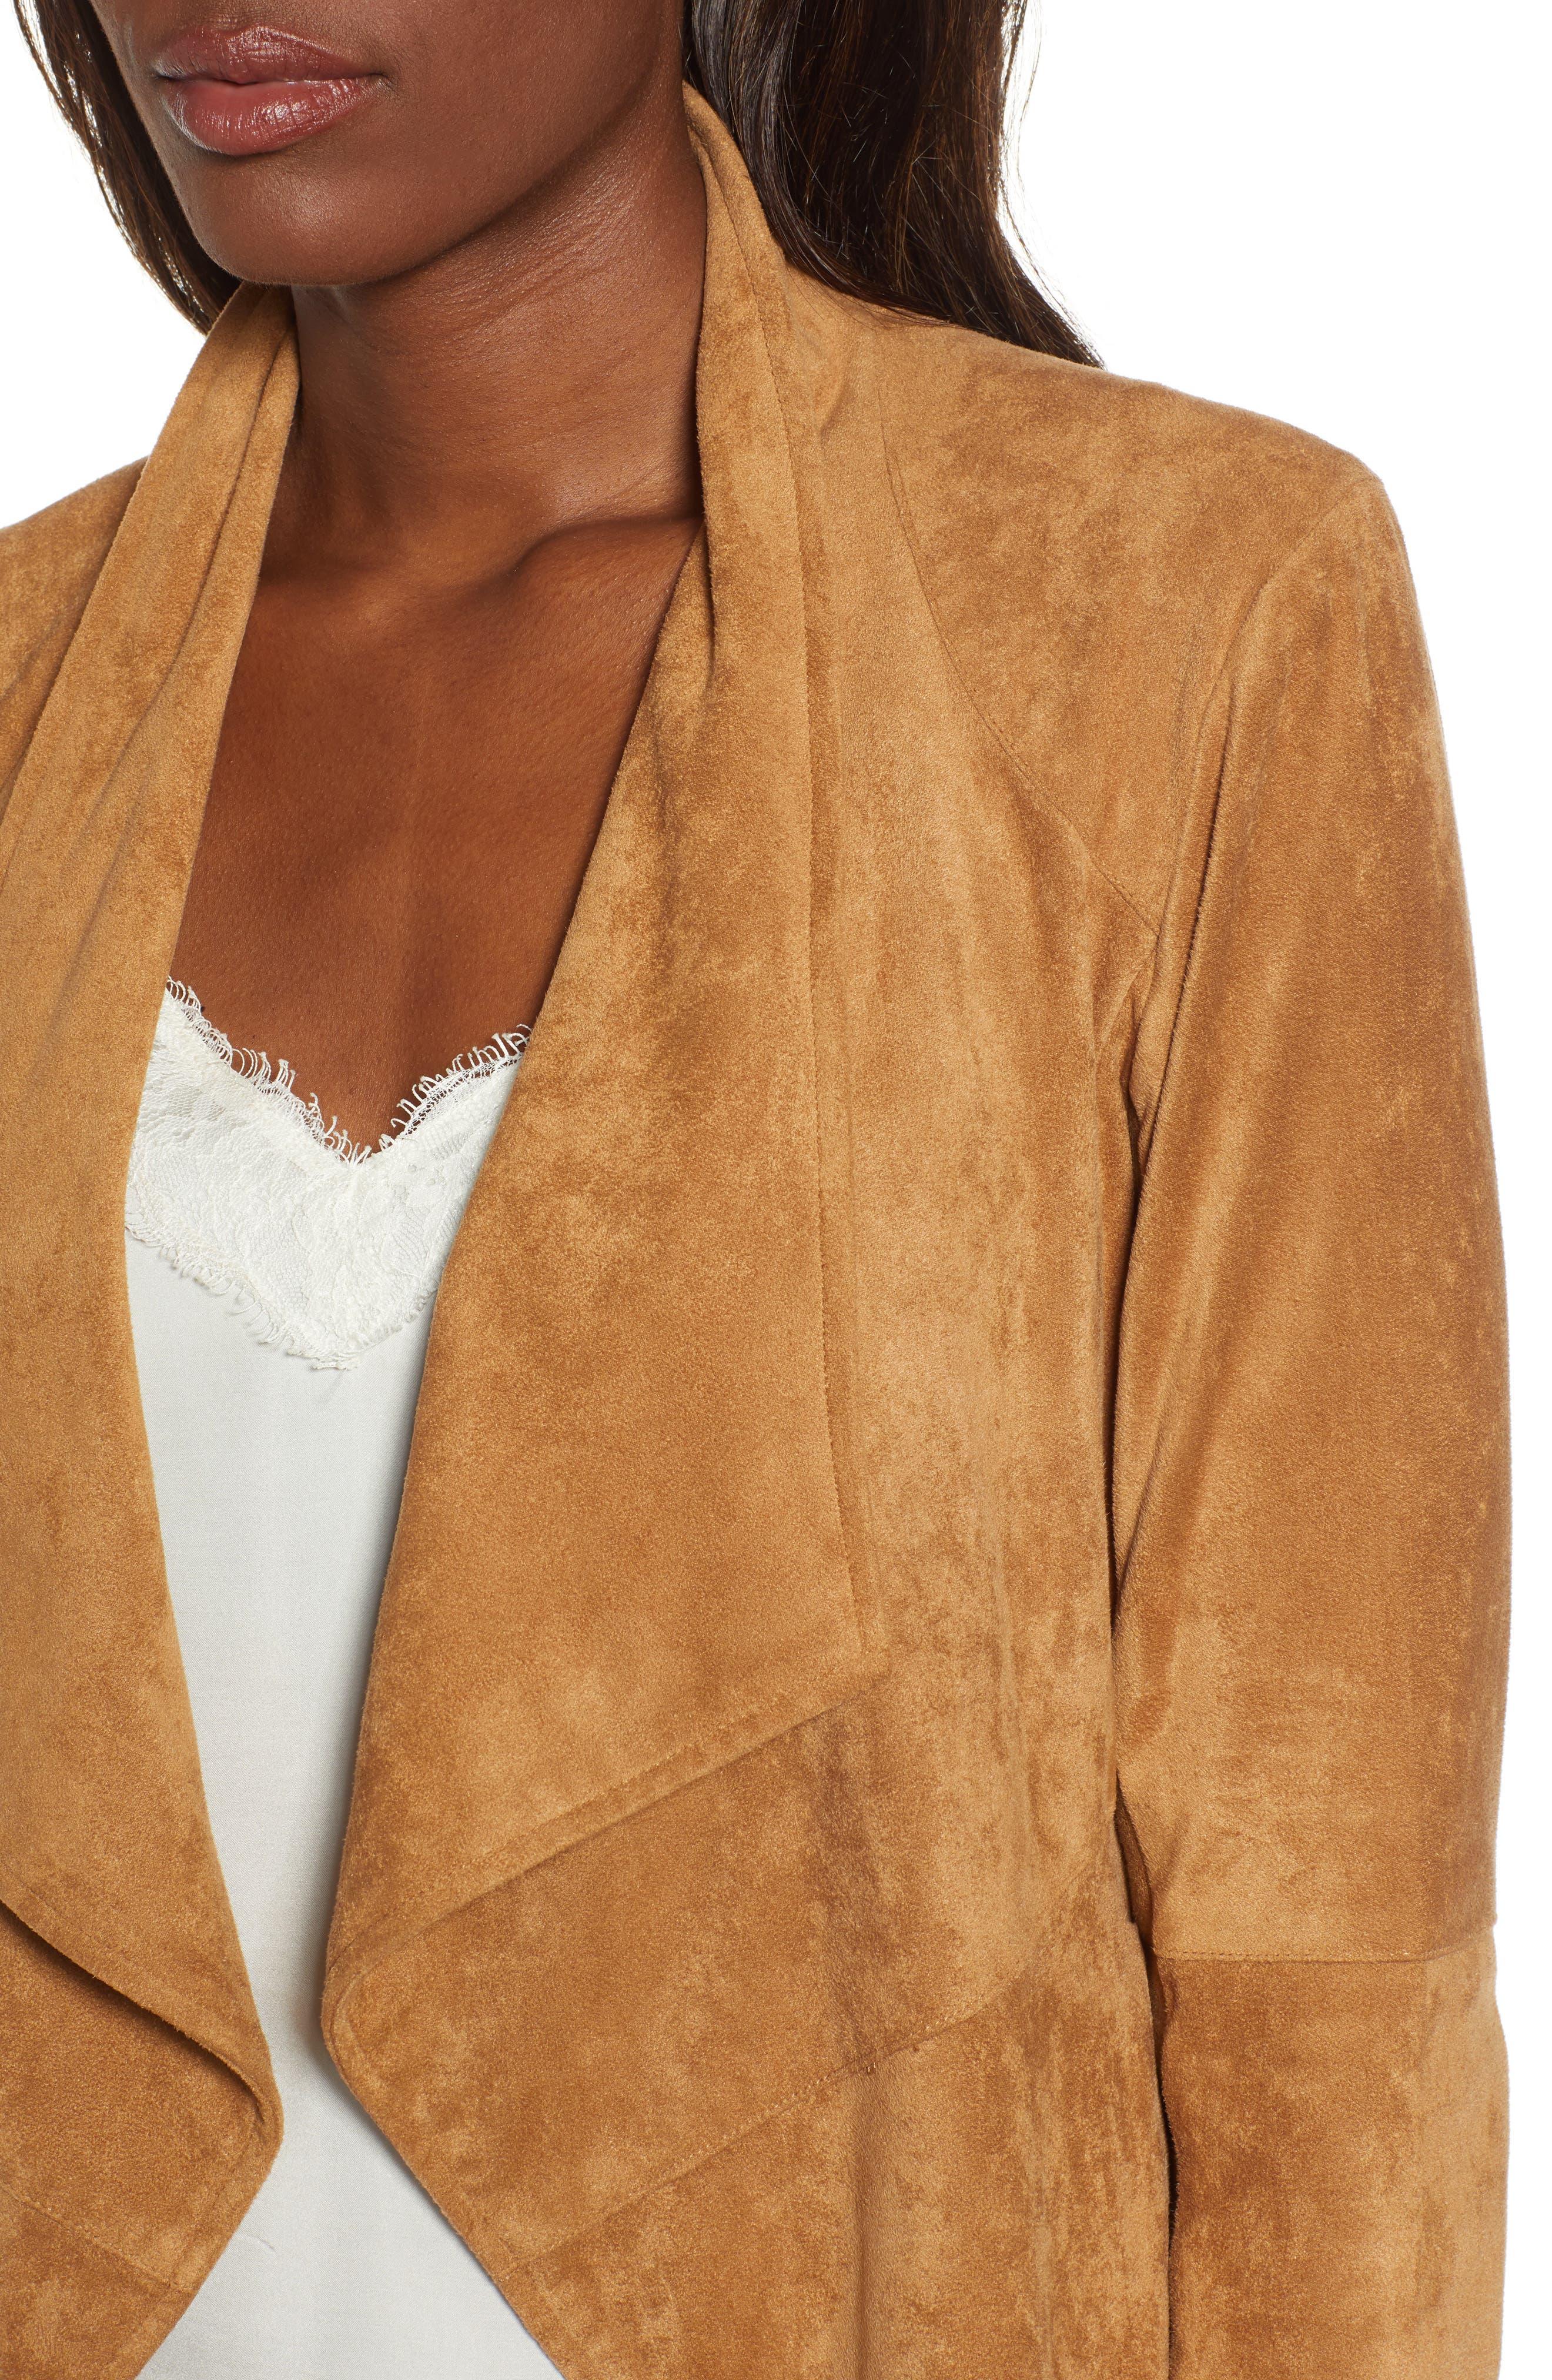 BB DAKOTA,                             Nicholson Faux Suede Drape Front Jacket,                             Alternate thumbnail 5, color,                             WHISKEY